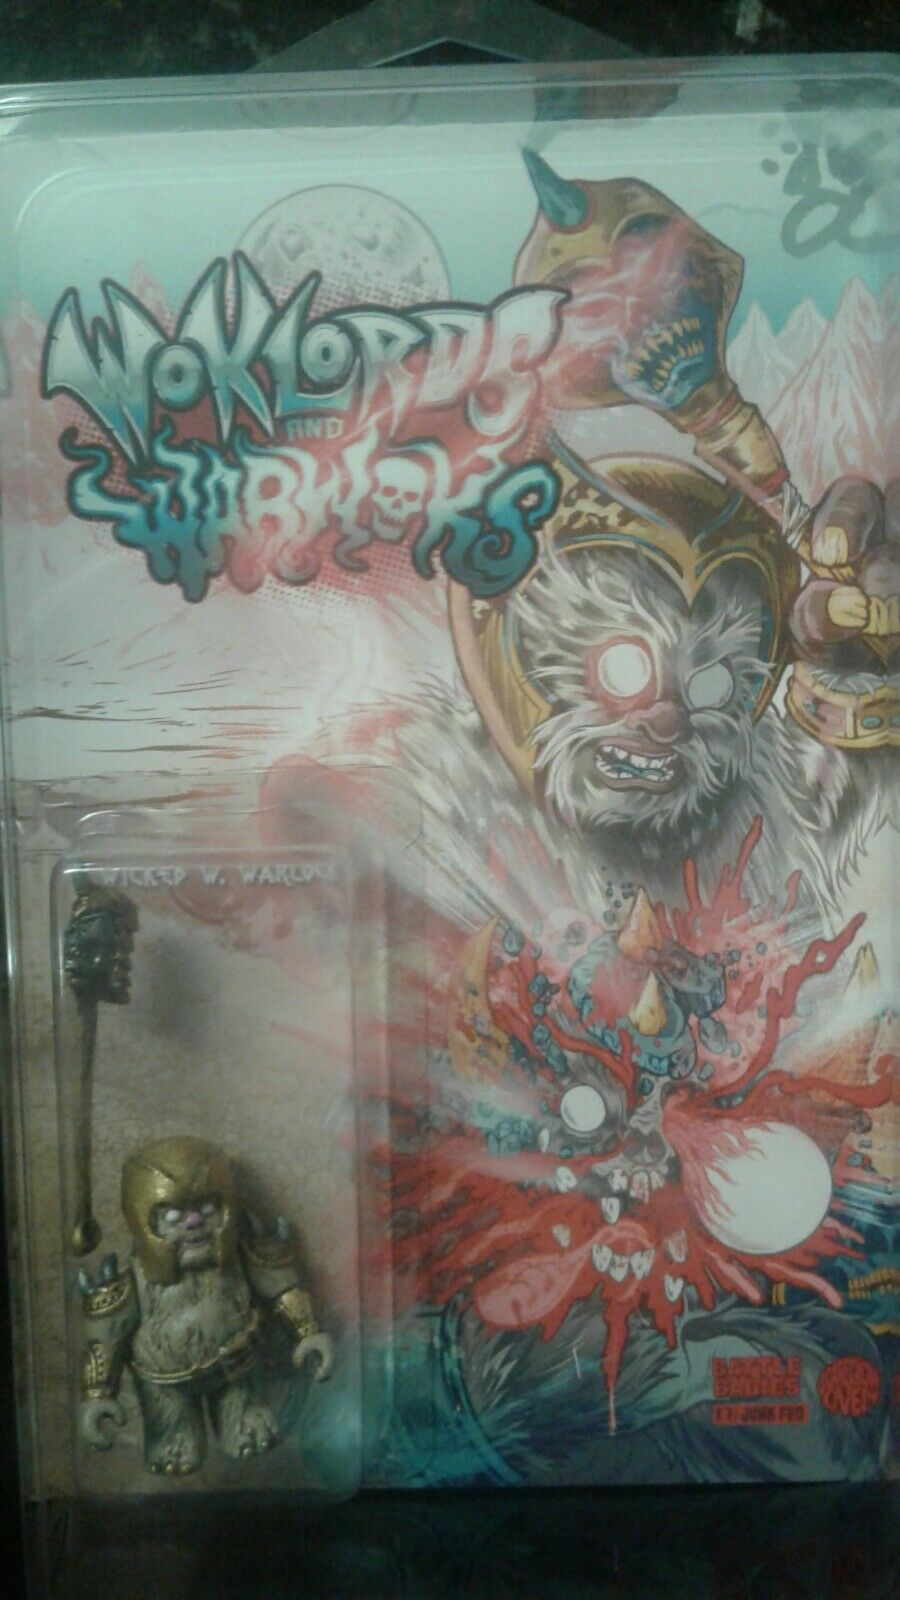 Estrella Wars Ewoks woklords & wabloks KILLER botaleg junkfed DKE sCocheecrowoven Nueva York Comic Con